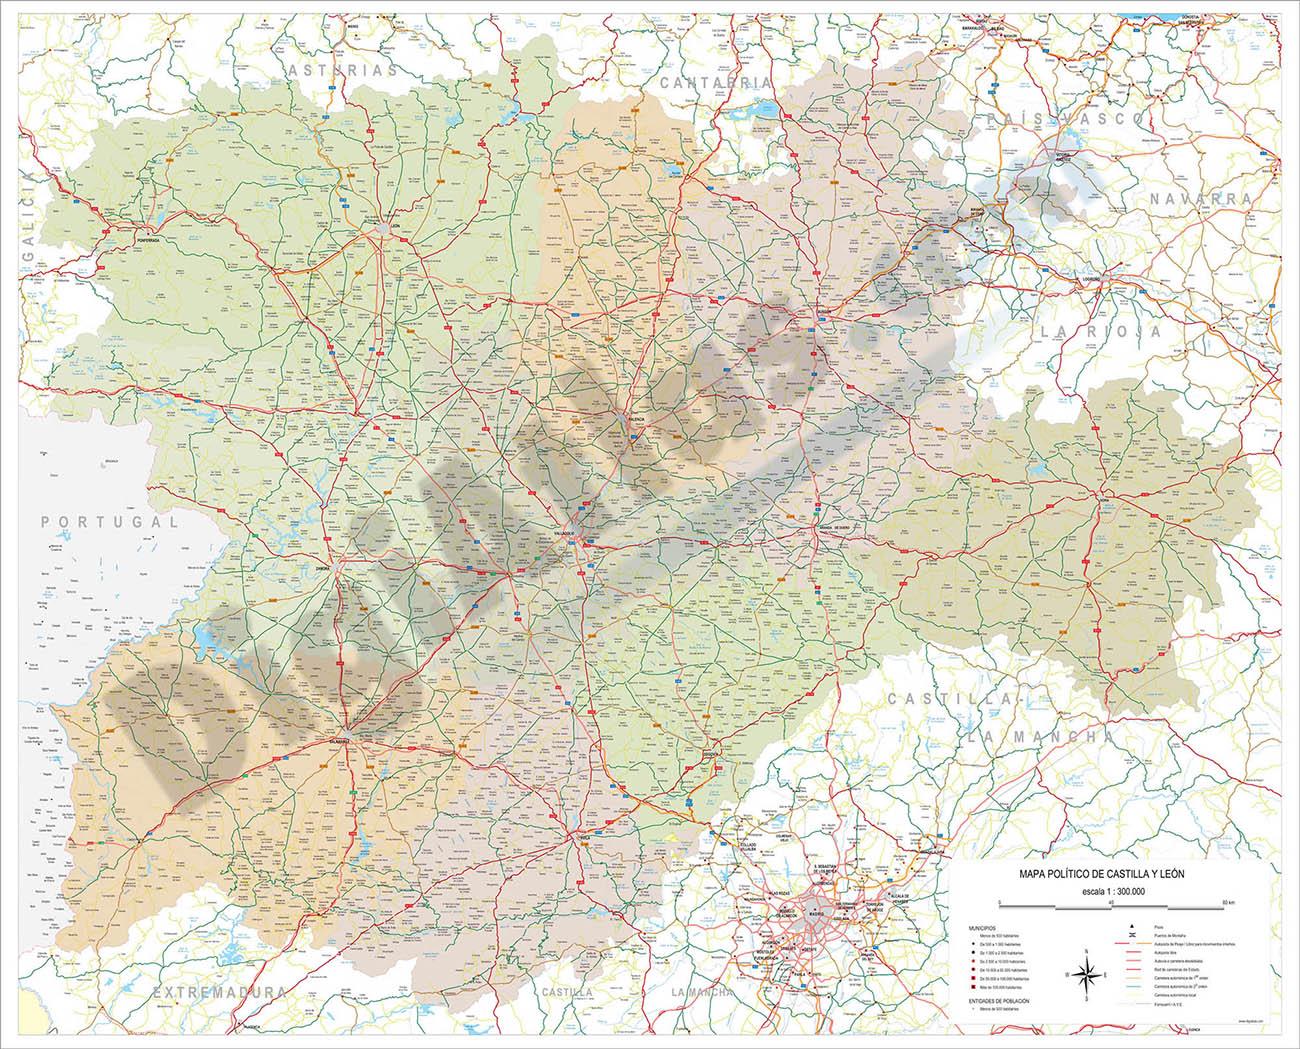 Map of Castilla y Leon autonomous community